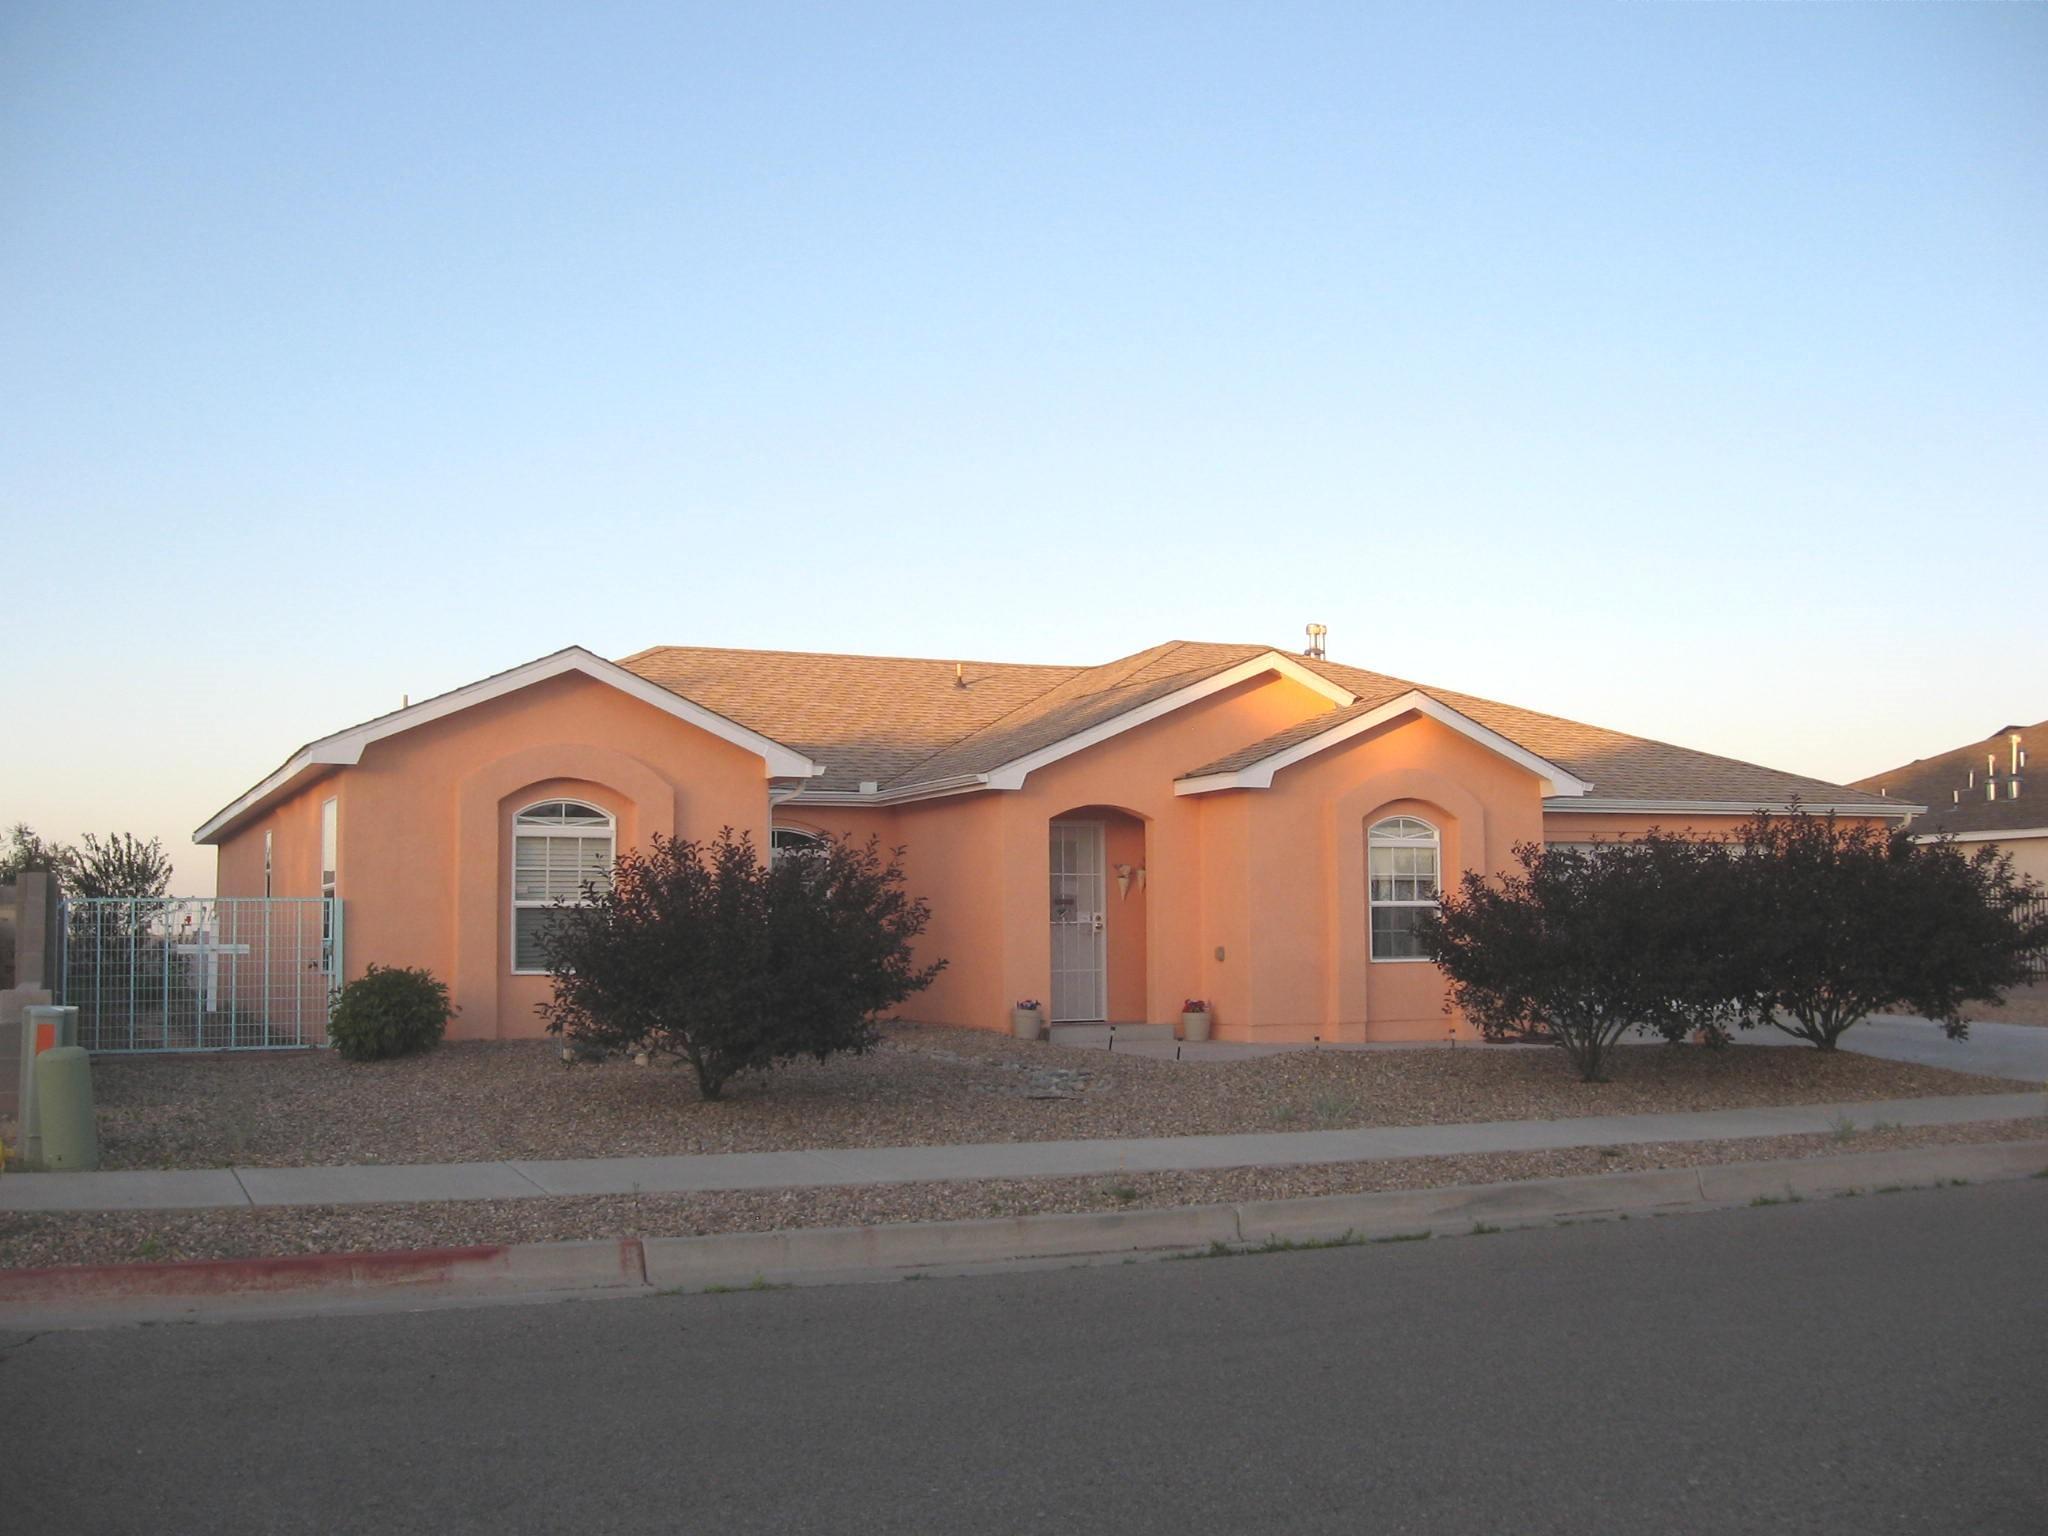 825 DESI Loop, Belen, NM 87002 - Belen, NM real estate listing